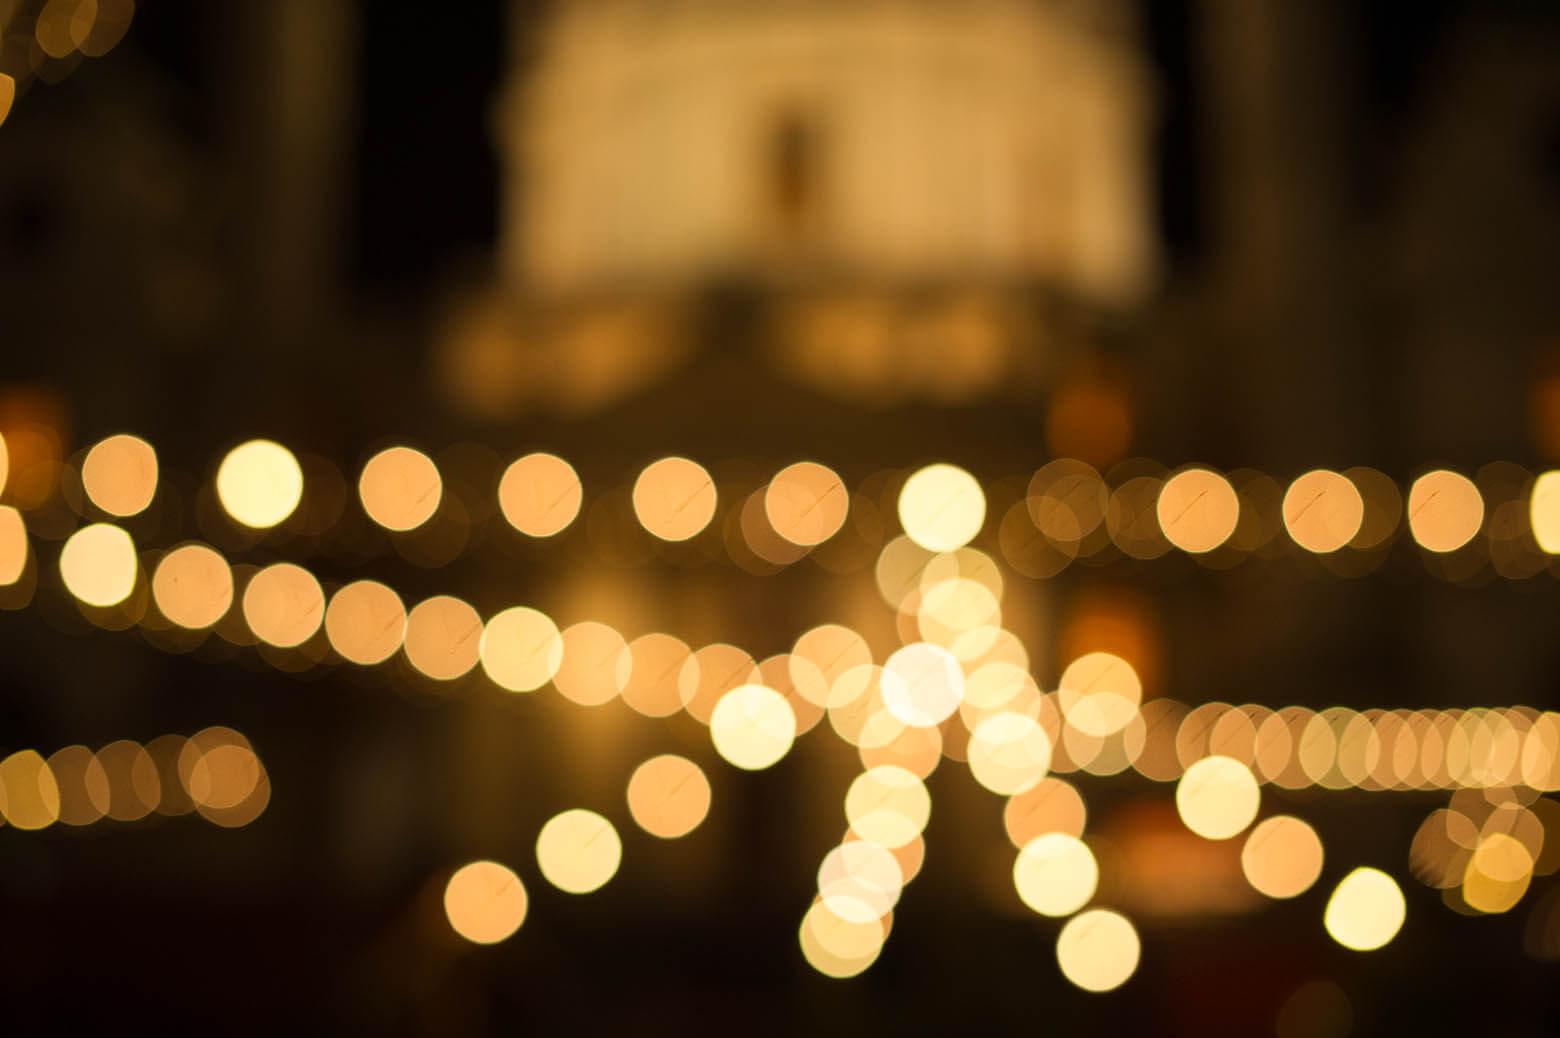 christmas in vienna, holidays, weihnachten, wien, portrait, fotografie, photography, dream, beauty, foto shoot, citylights